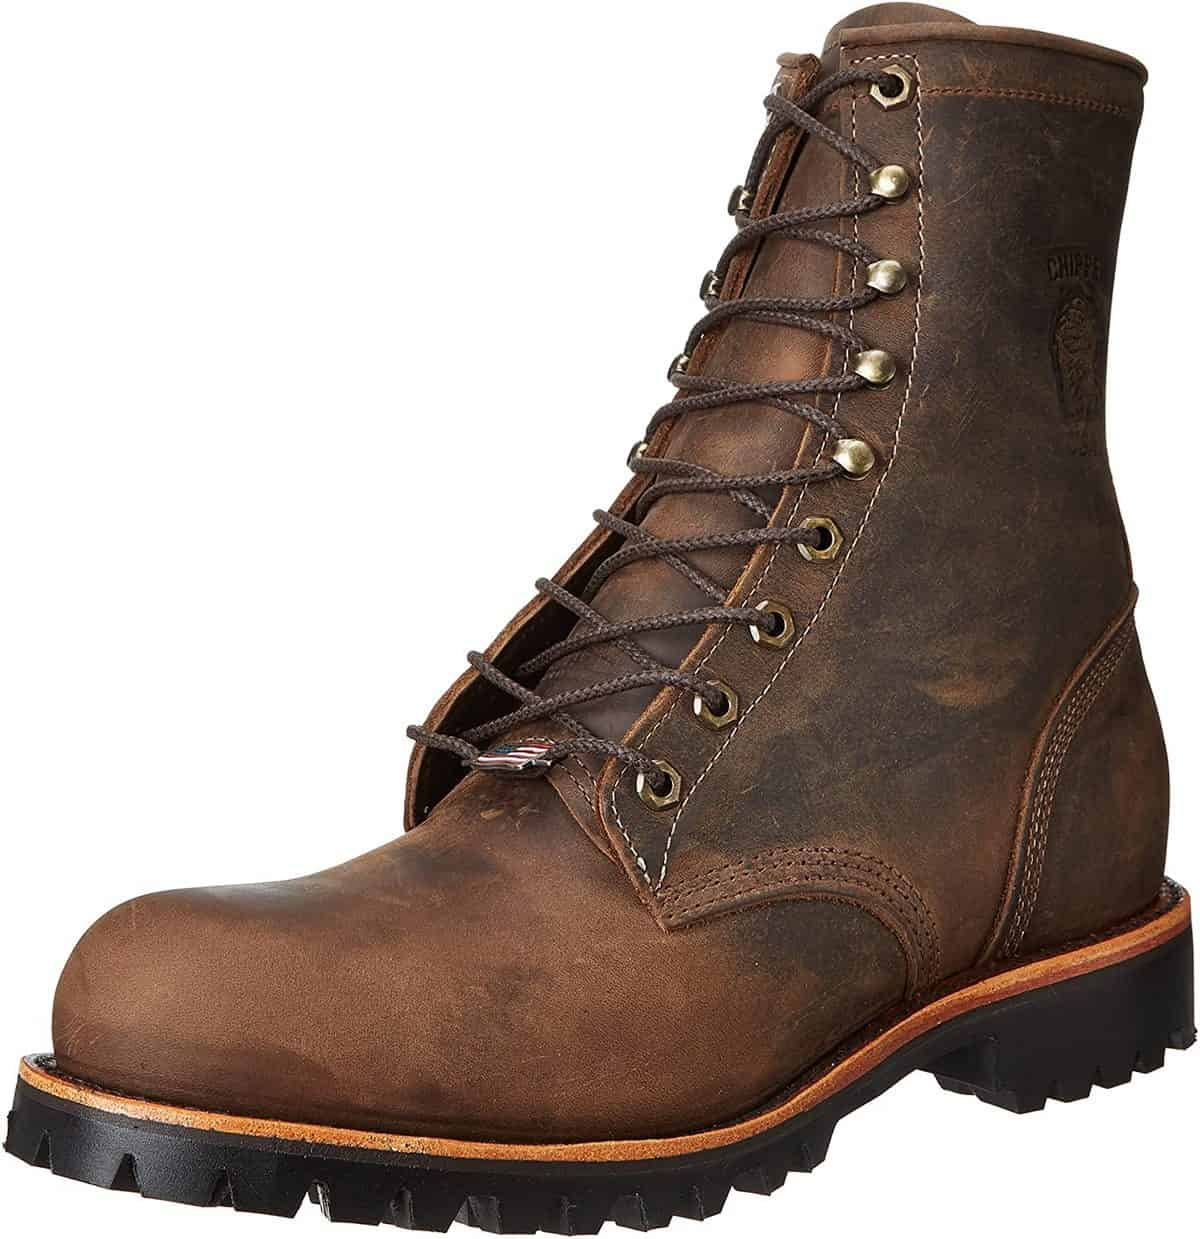 Chippewa Men's Steel Toe EH 20076 Pull-On Boots